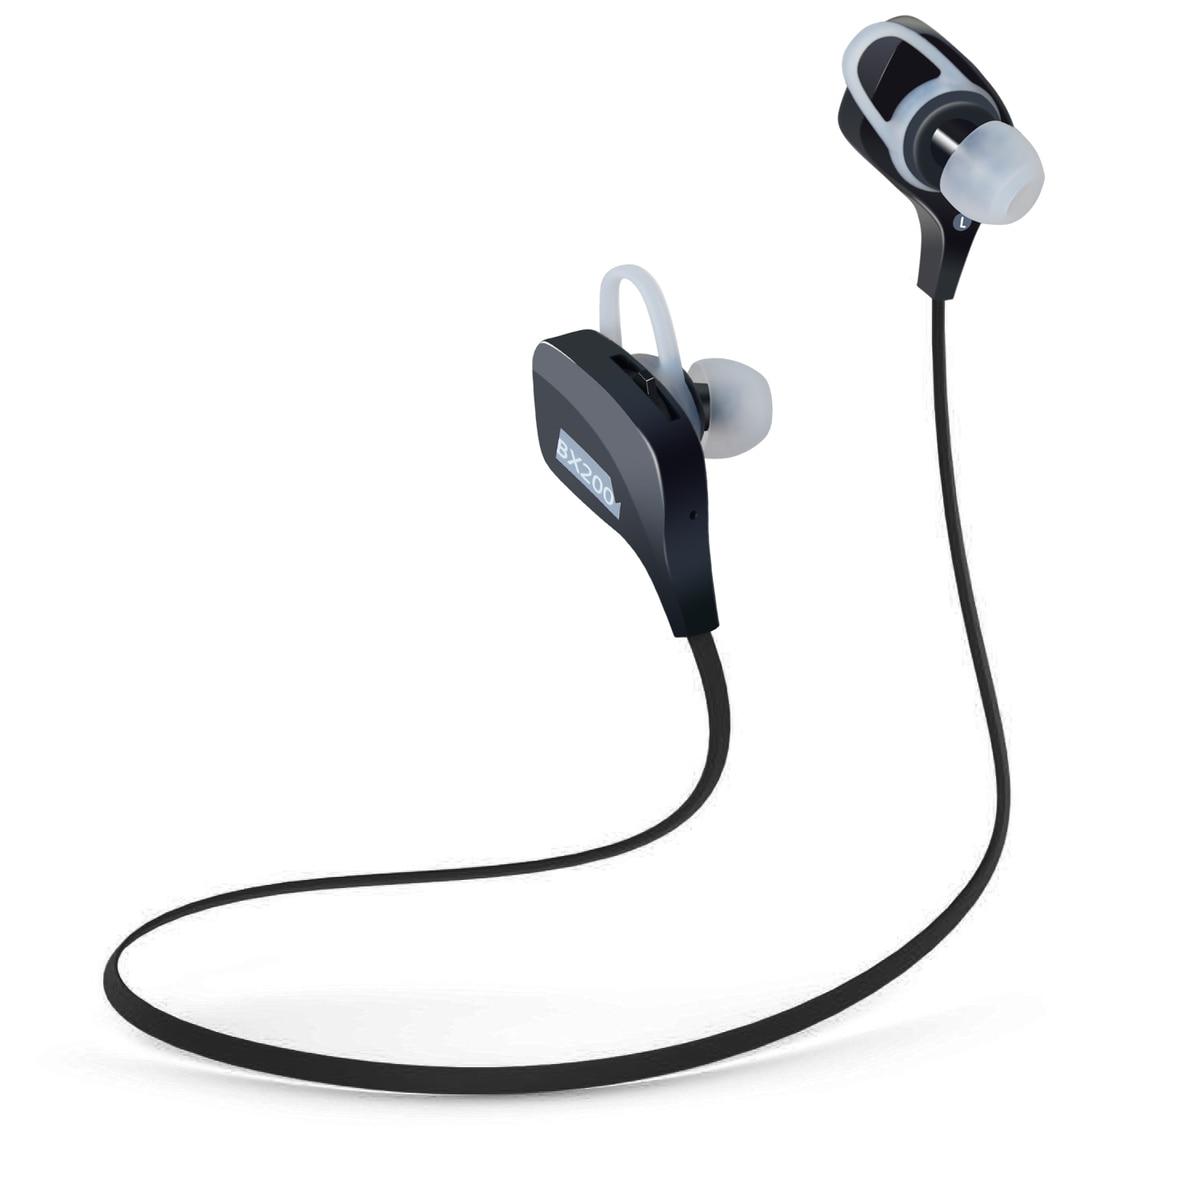 plextone noise cancelling wireless earphones bluetooth 4 1 sport headphones running gym exercise. Black Bedroom Furniture Sets. Home Design Ideas